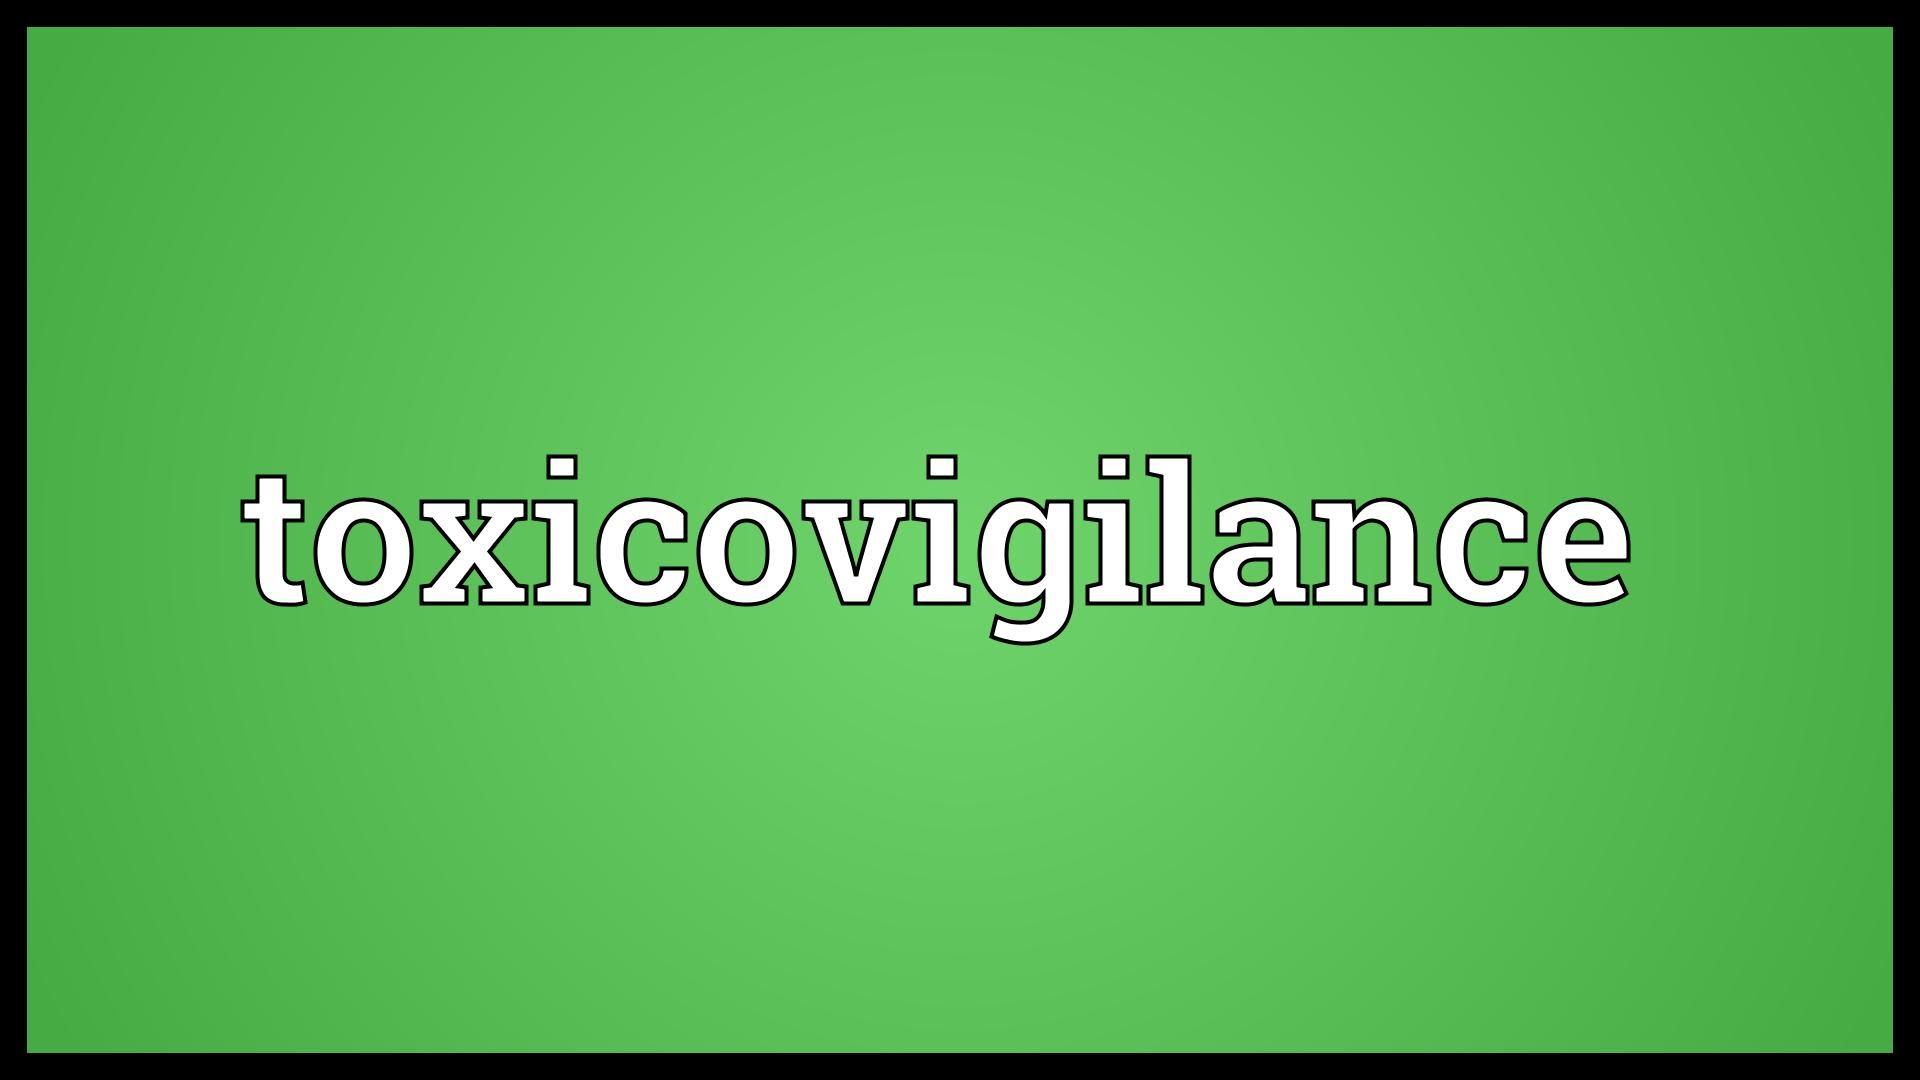 Toxicovigilance Photo